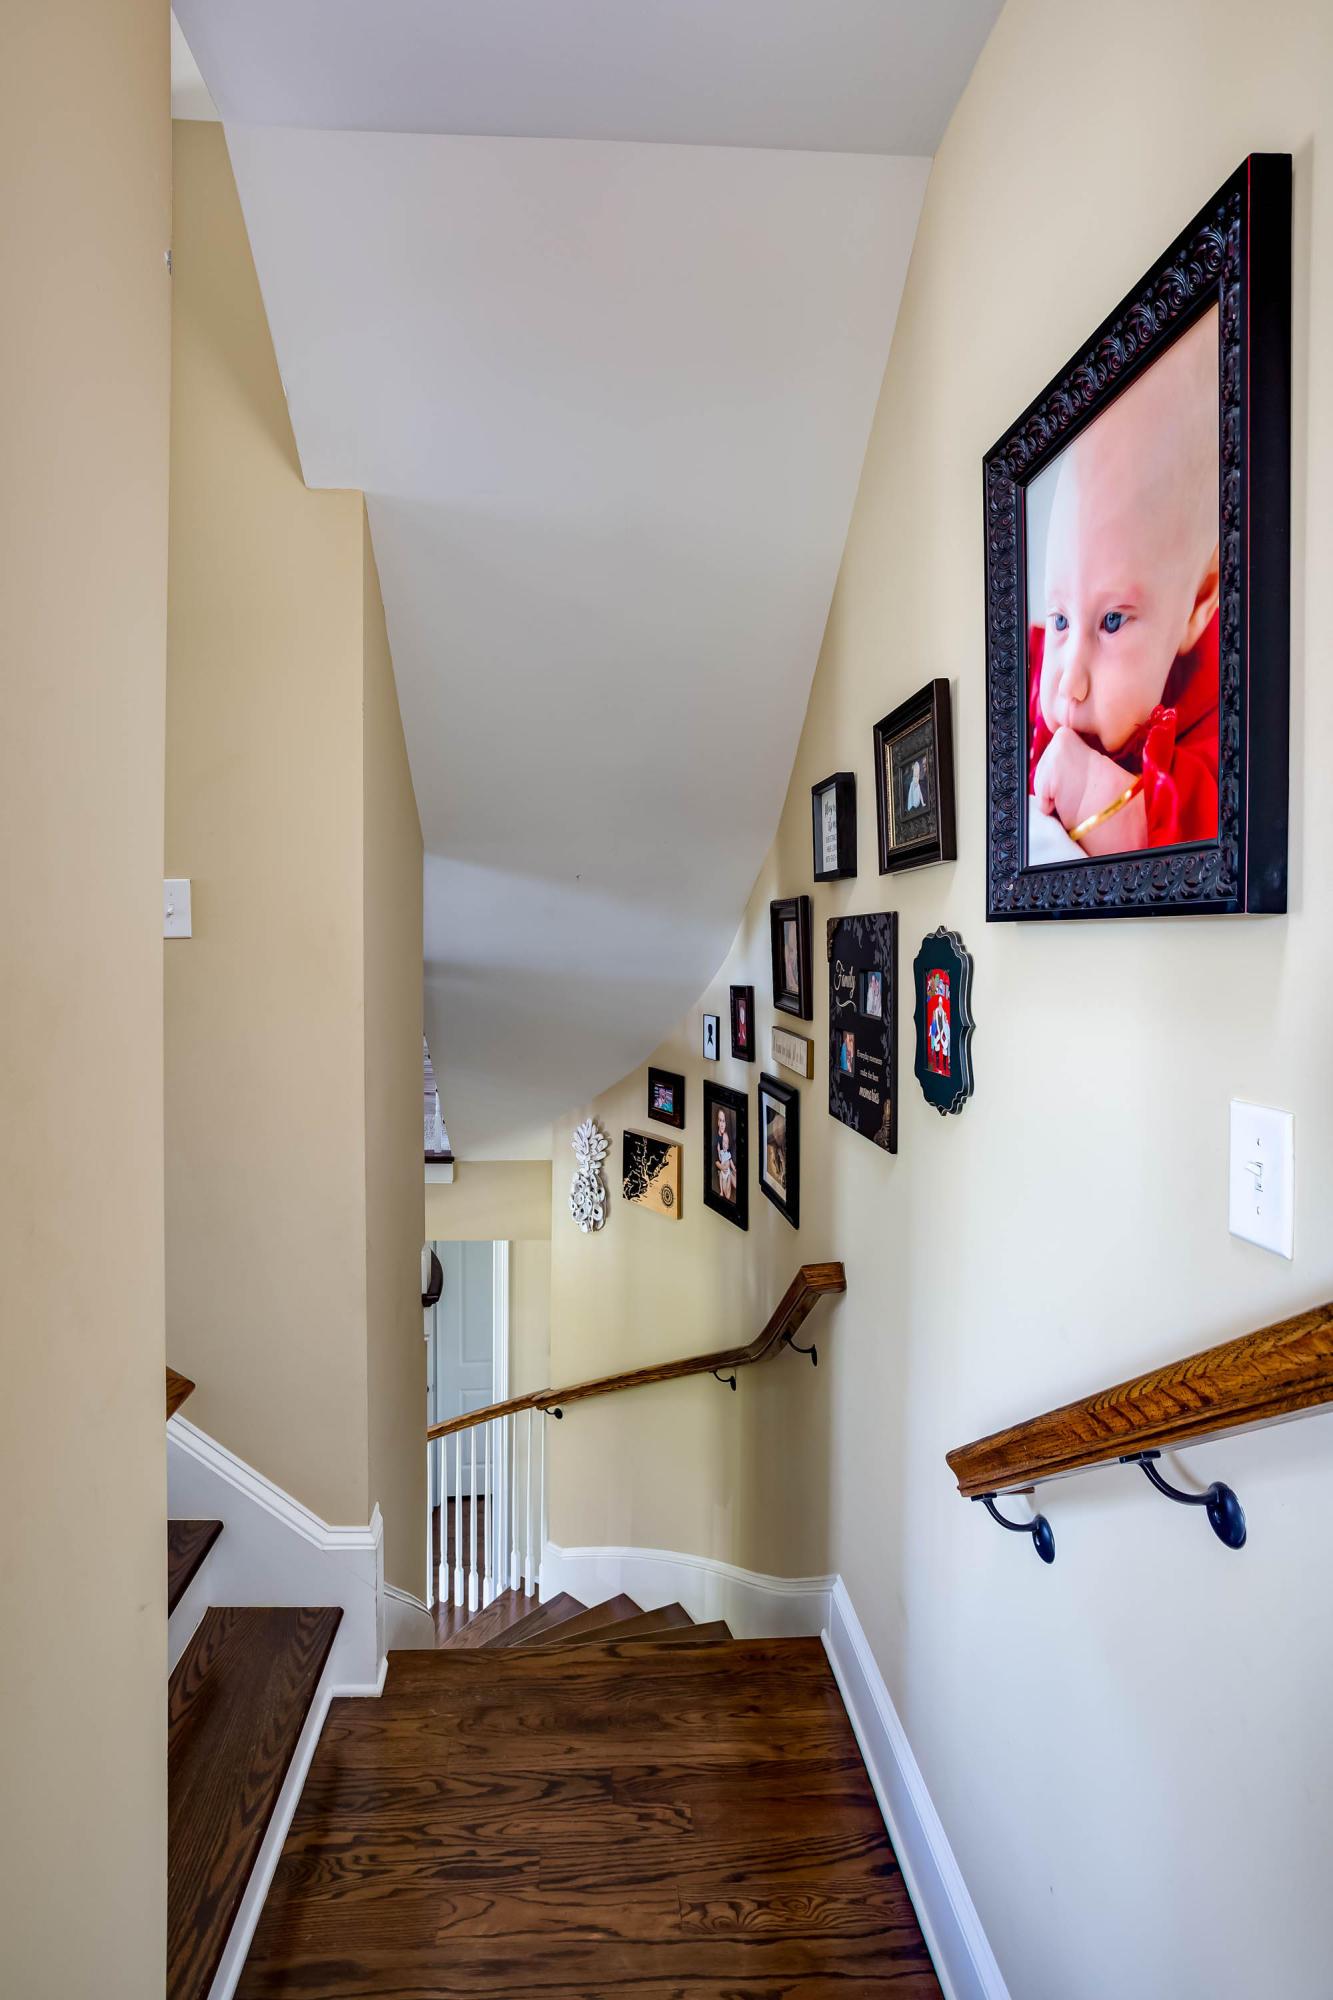 Dunes West Homes For Sale - 3216 Hatchway, Mount Pleasant, SC - 30